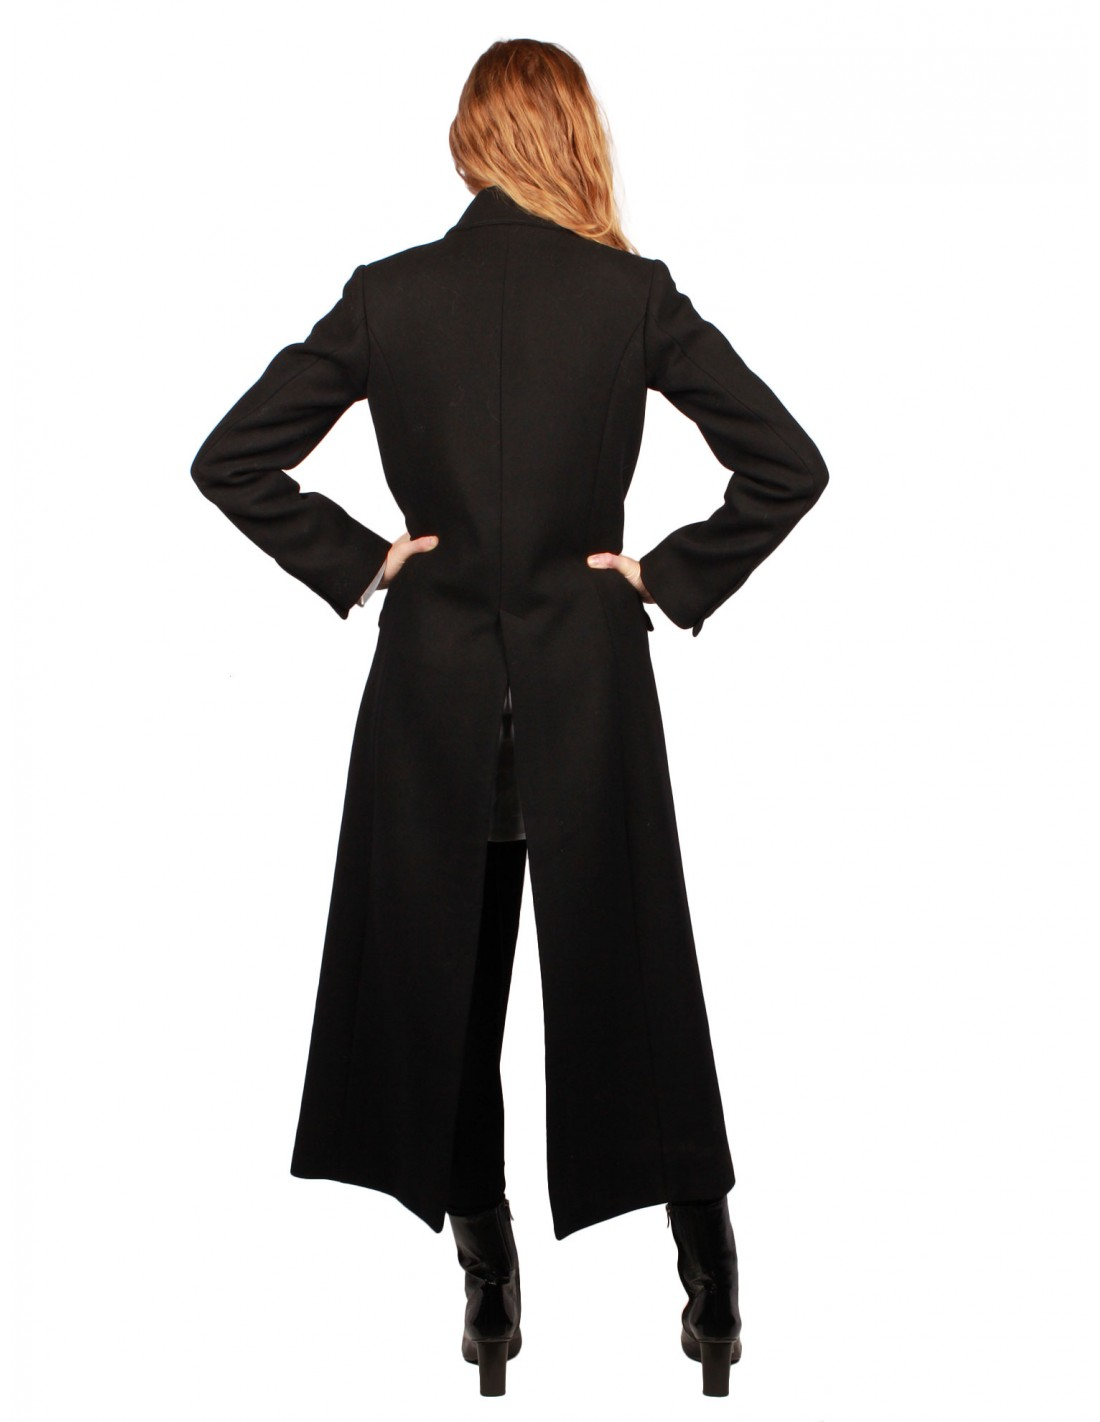 femme-long-manteau-noir-isabel-benenato-fw17.jpg 6d1971a6400